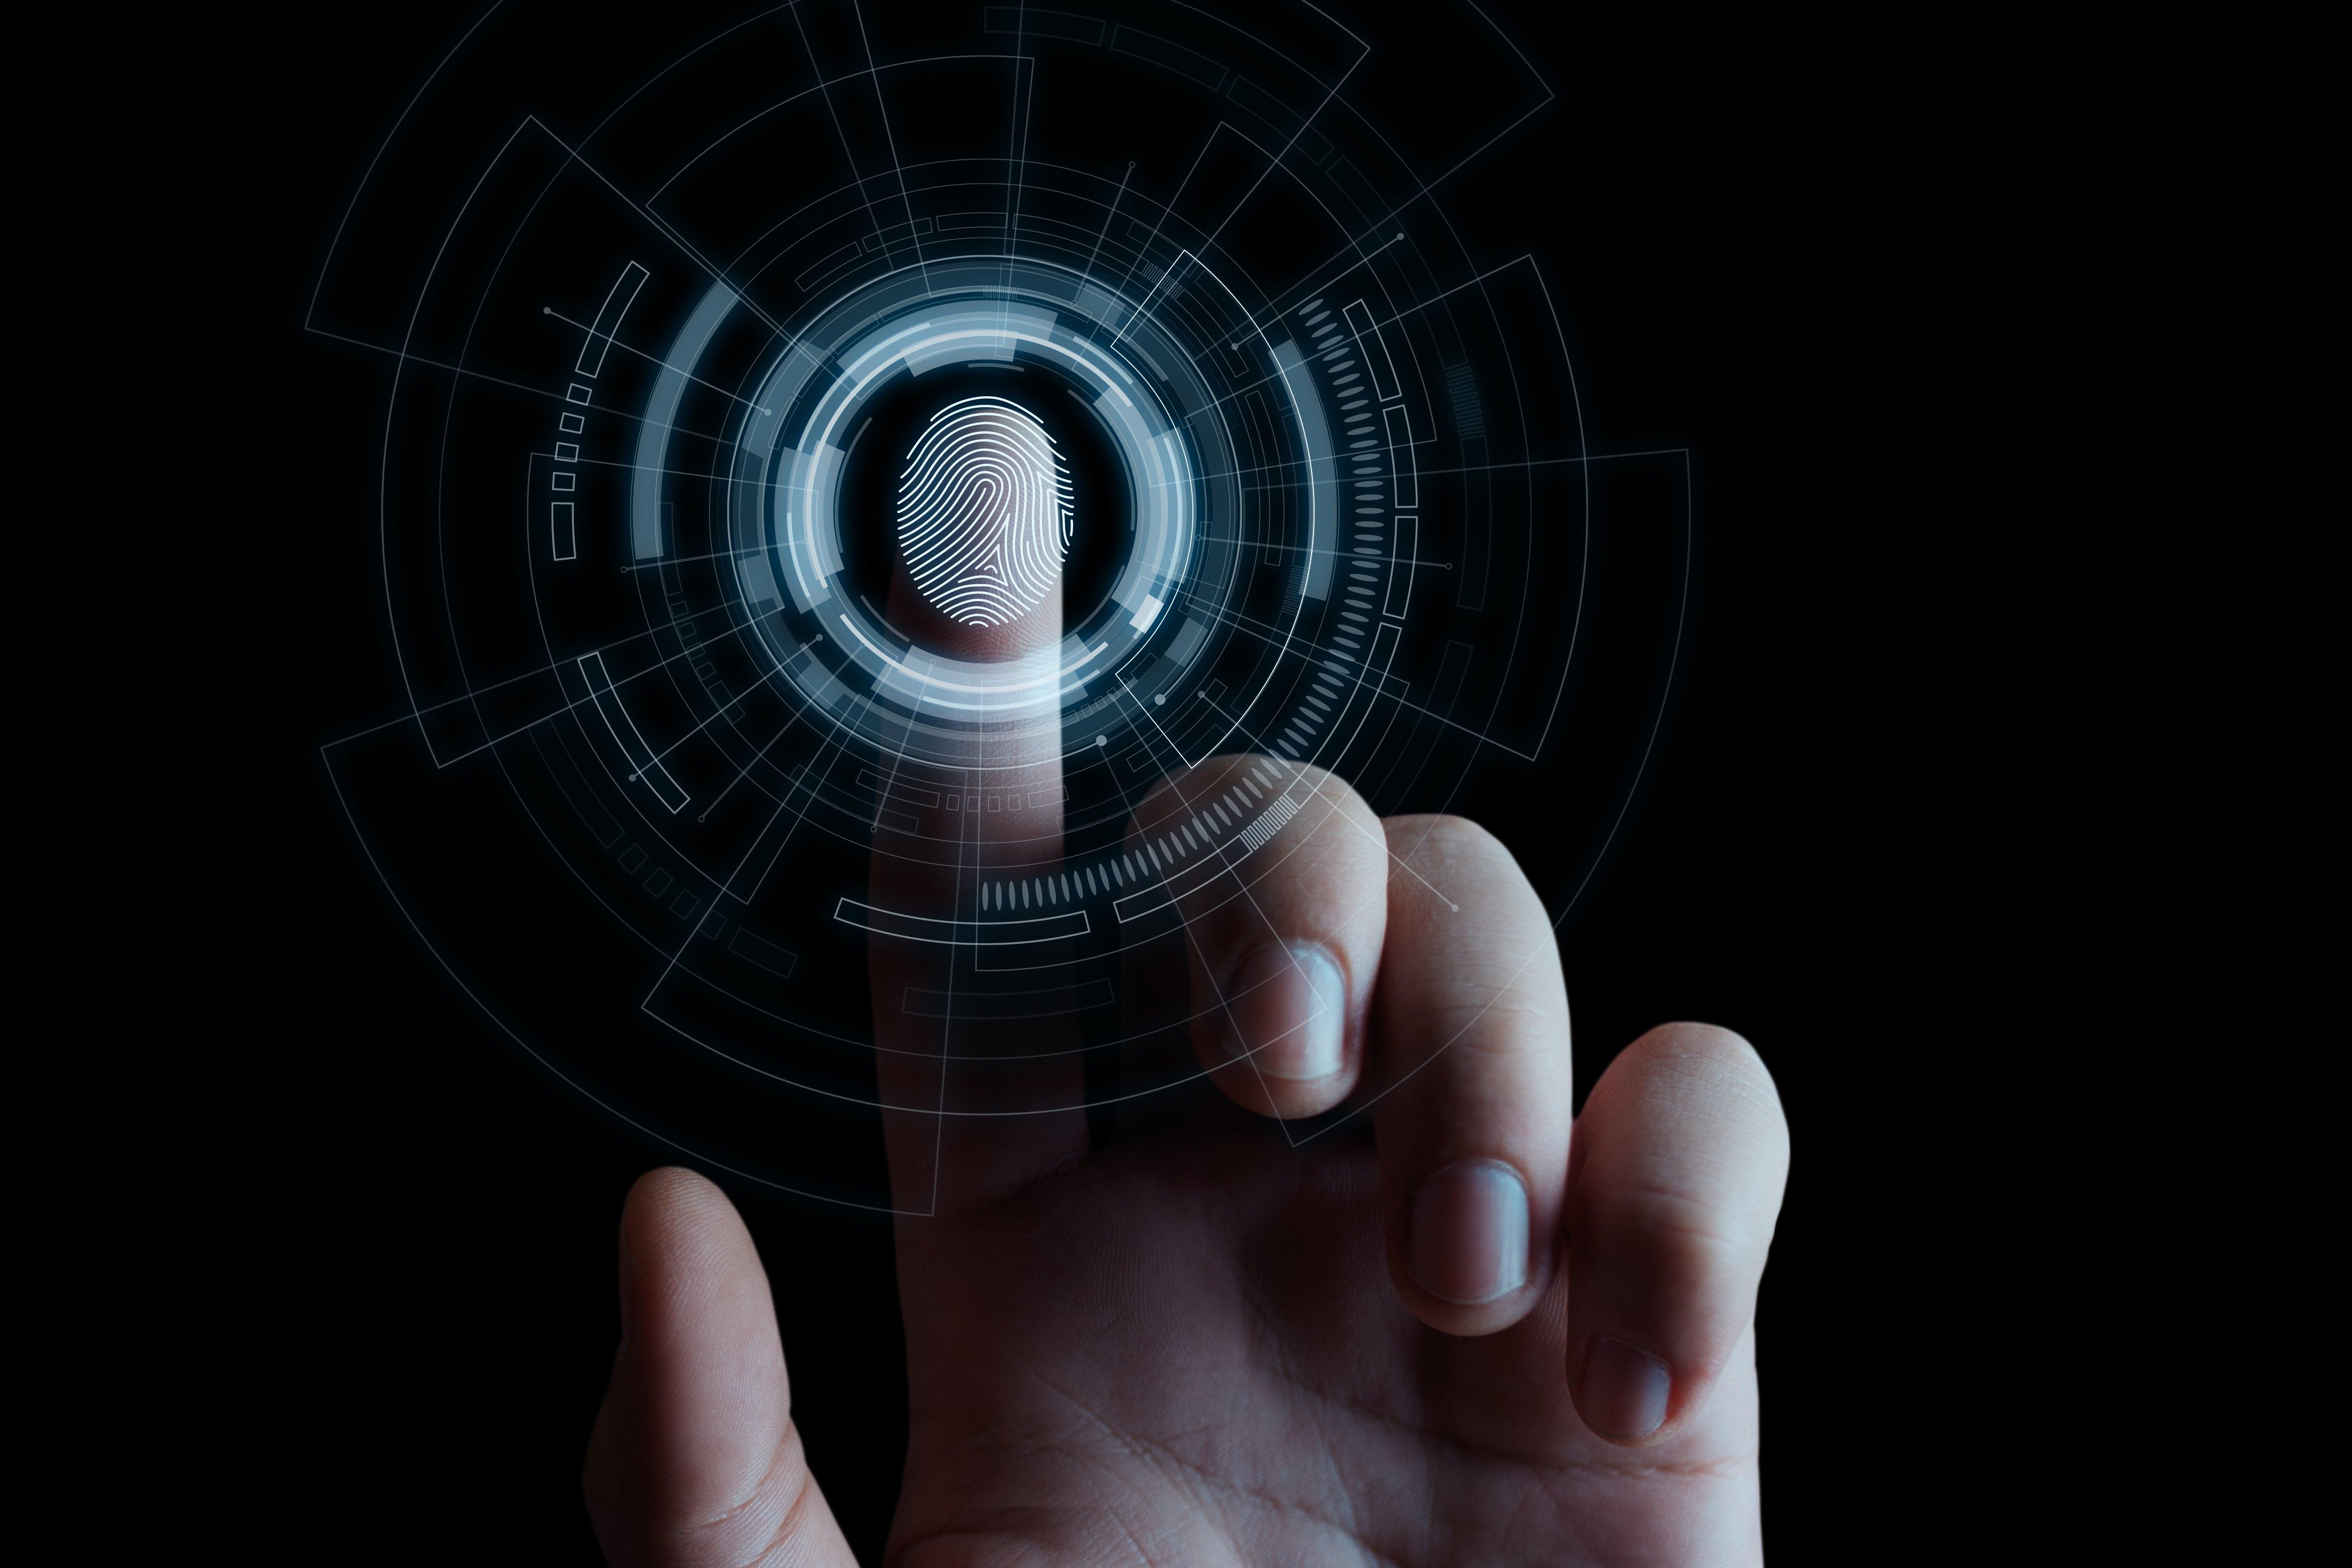 Imageware LE 2.0: Web-Based Biometric & Biographic Capture & Investigative Software